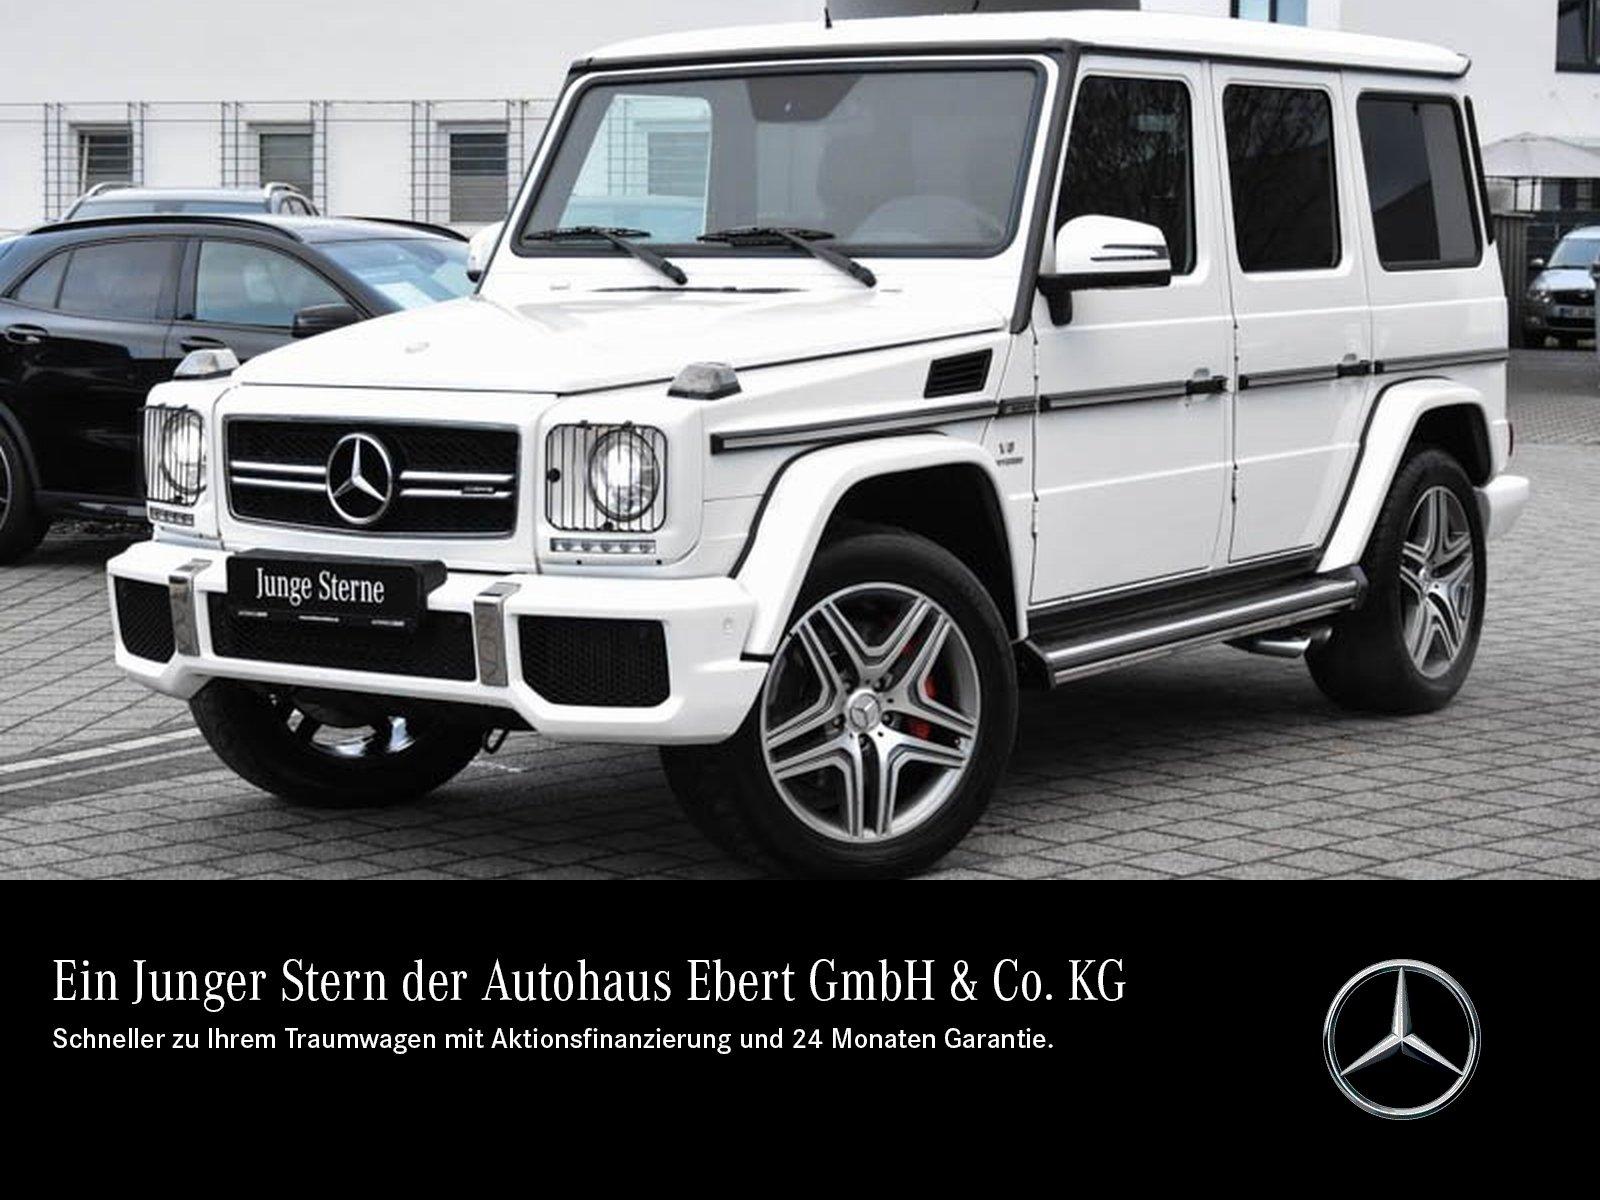 Mercedes-Benz G 63 AMG COMAND+STDHZG+BI-XENON+ESHD+KAMERA, Jahr 2016, Benzin